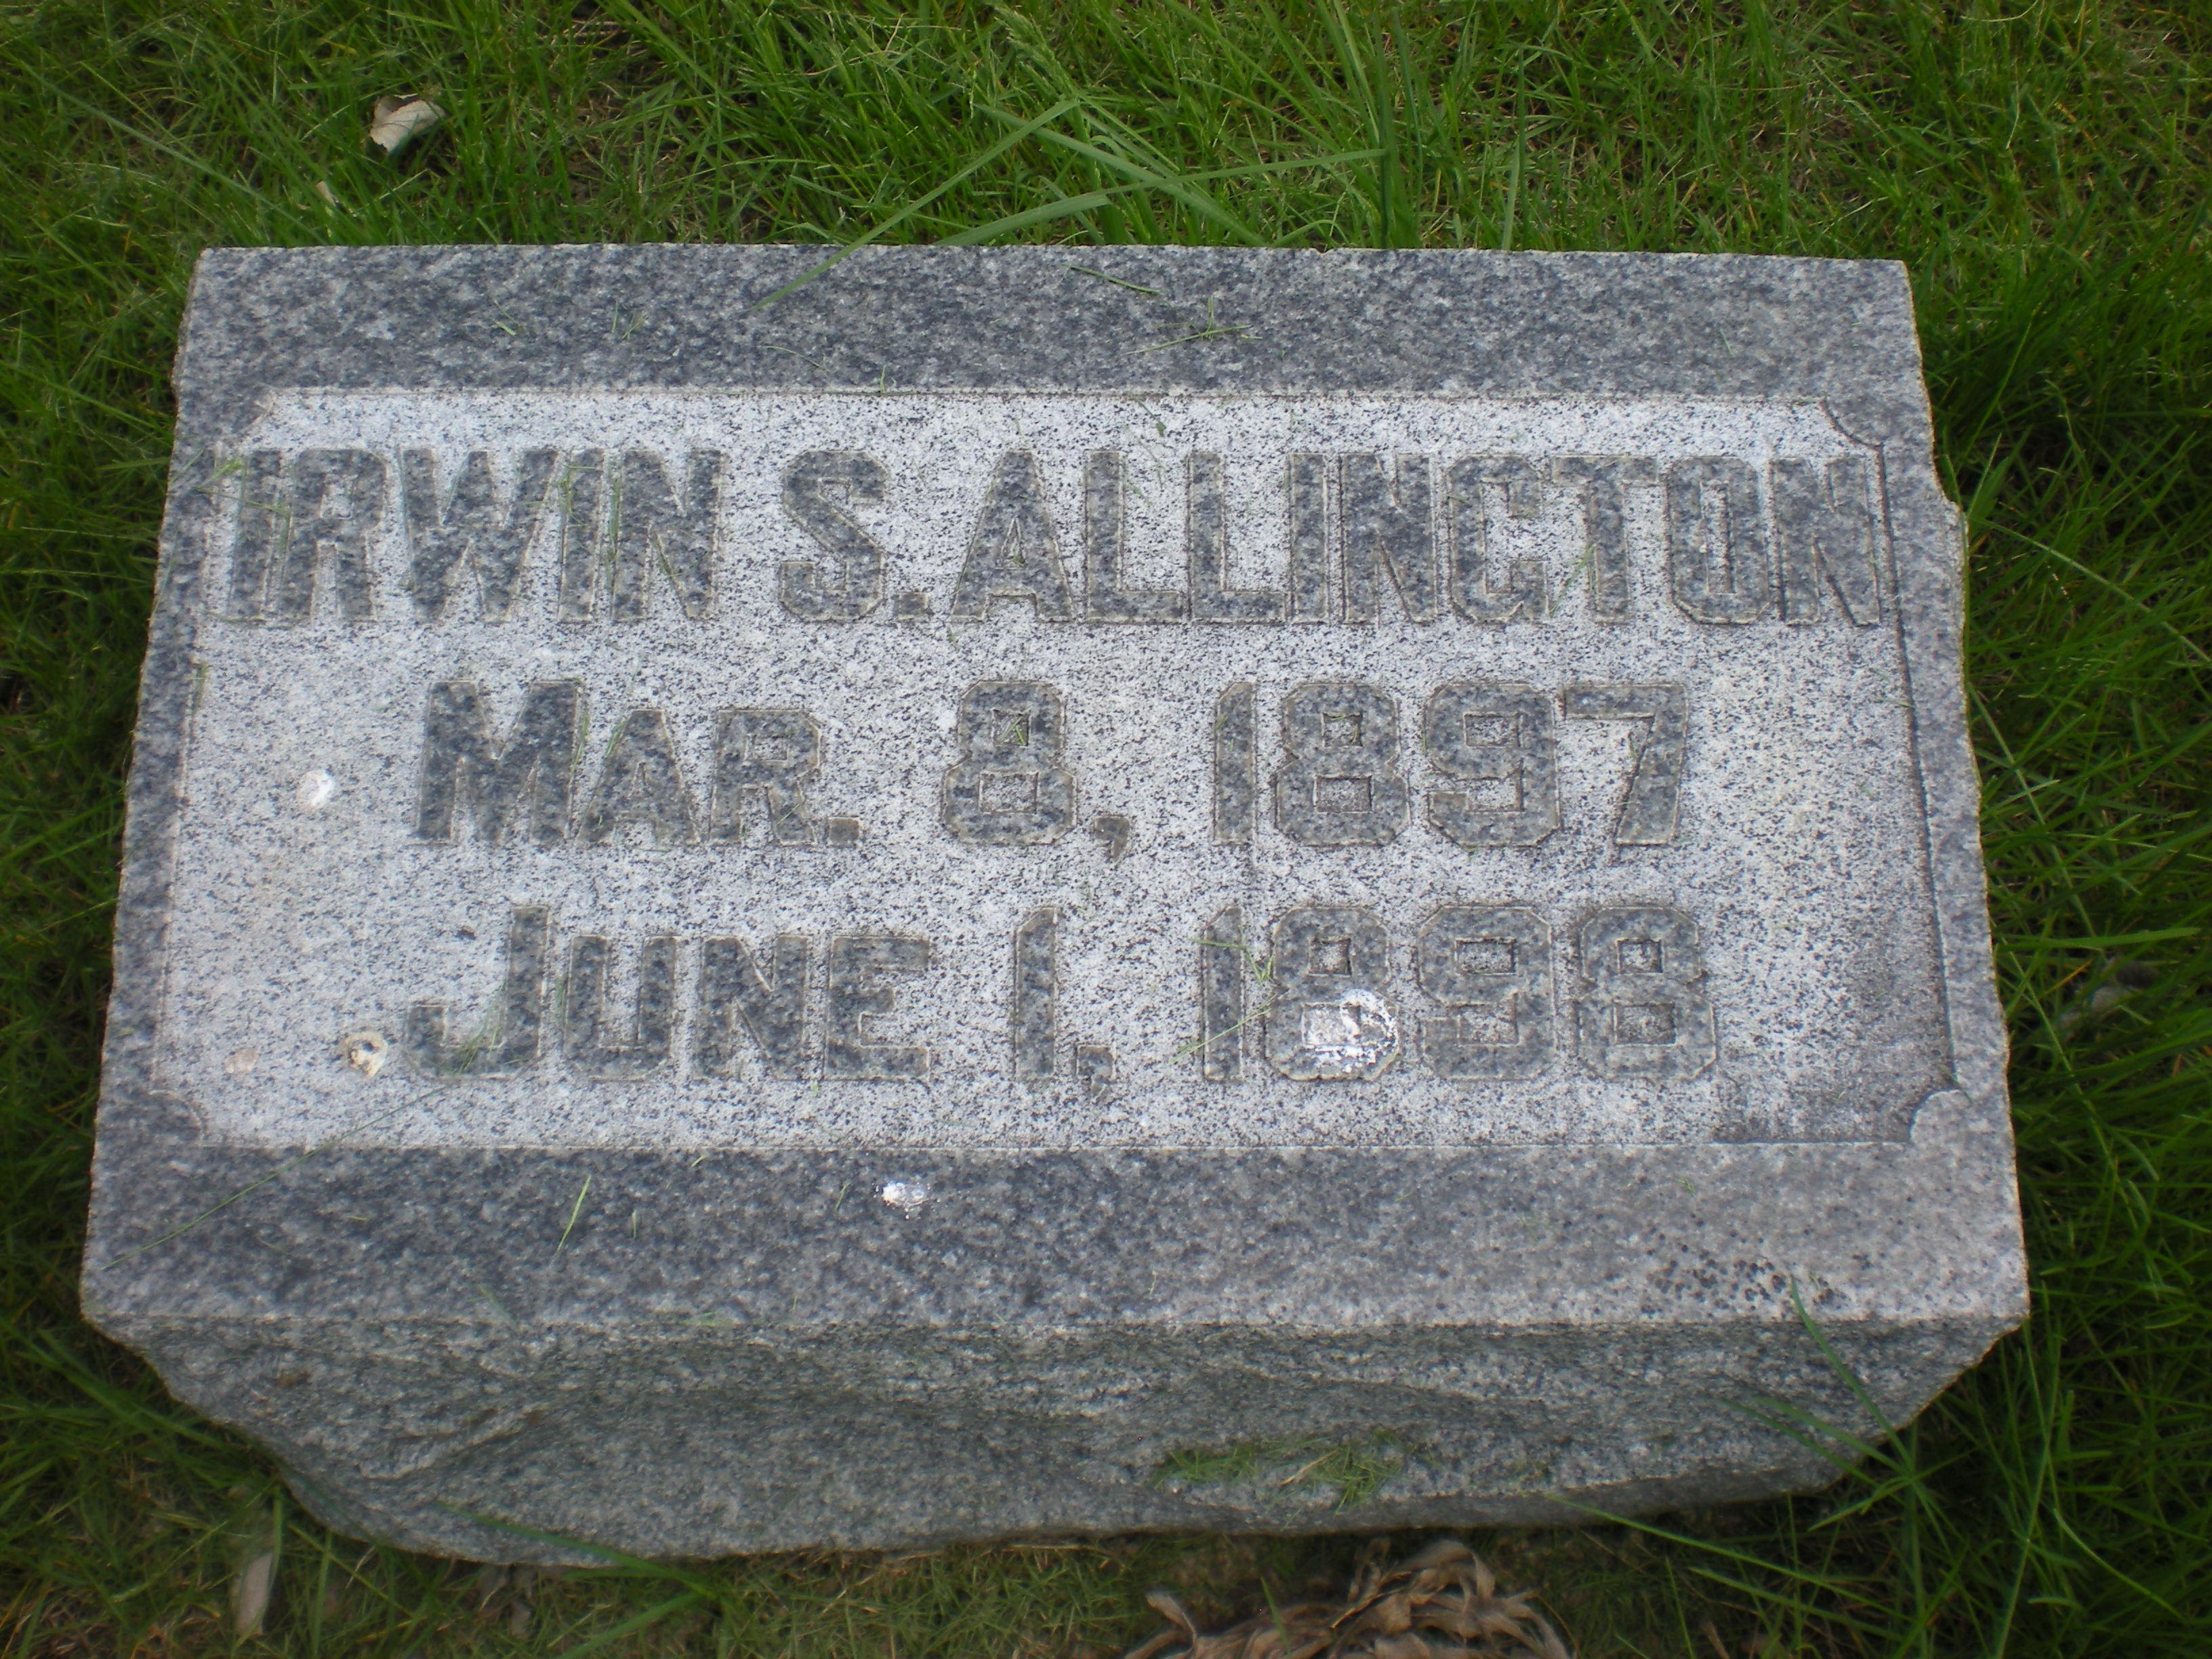 Irwin S. Allington